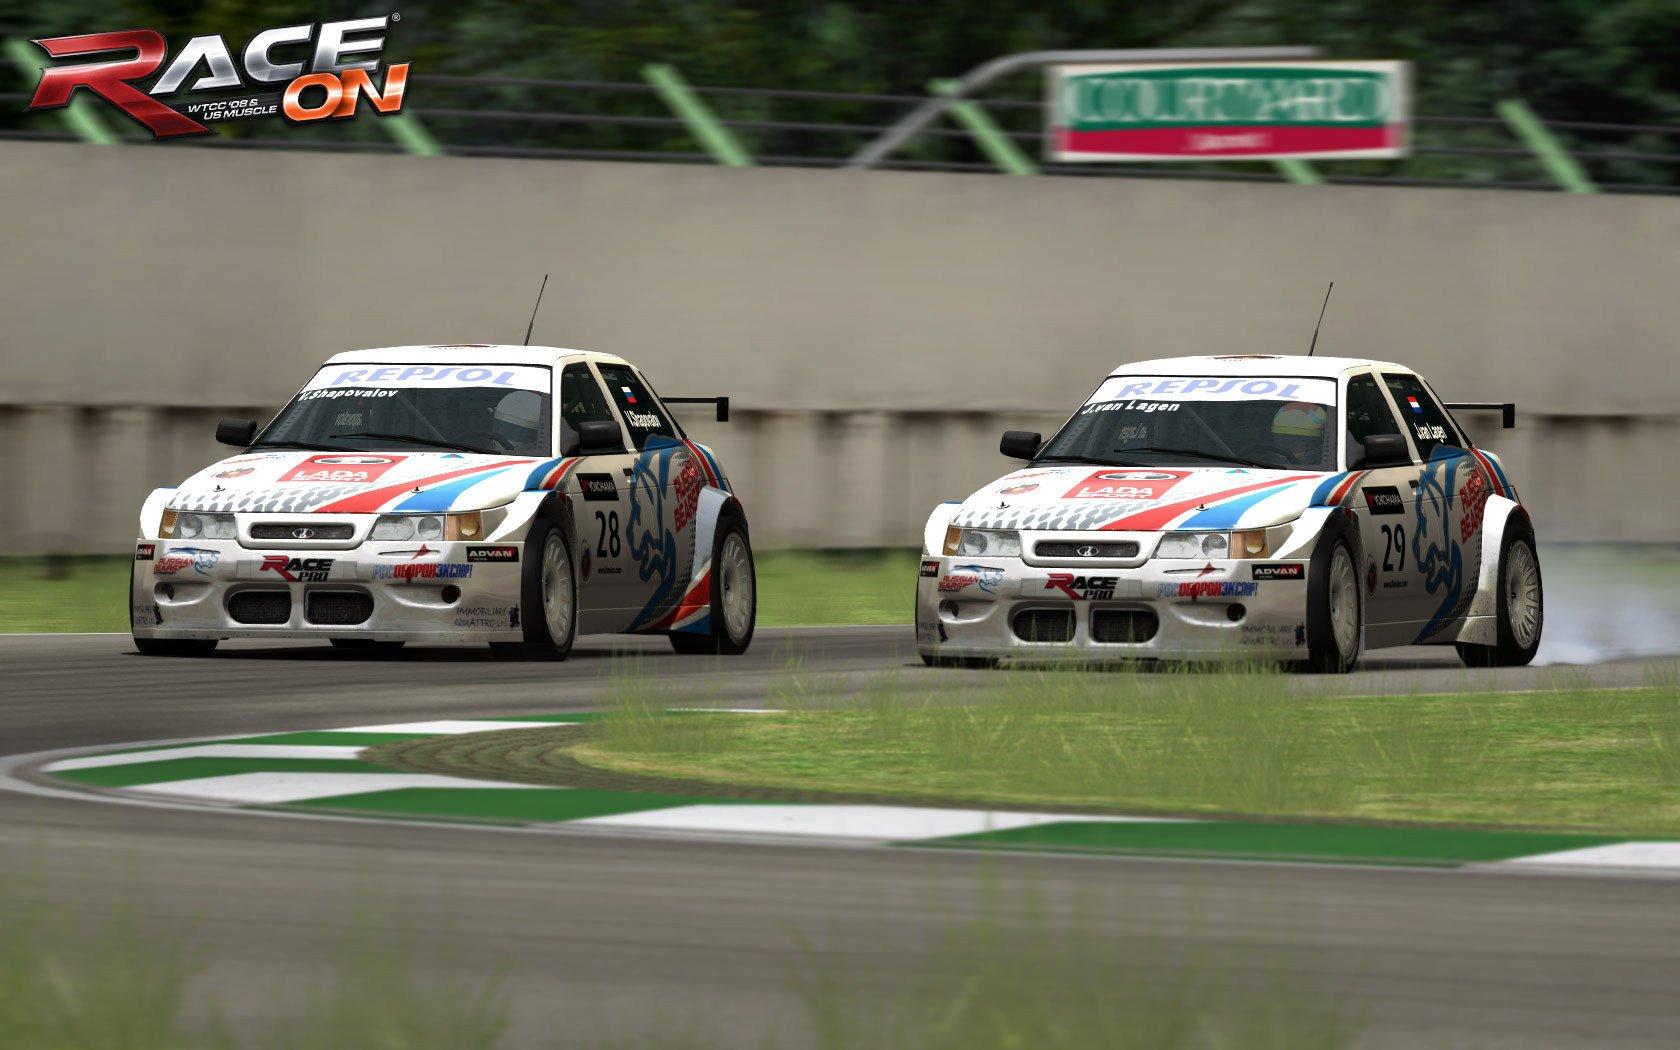 RACE On 25